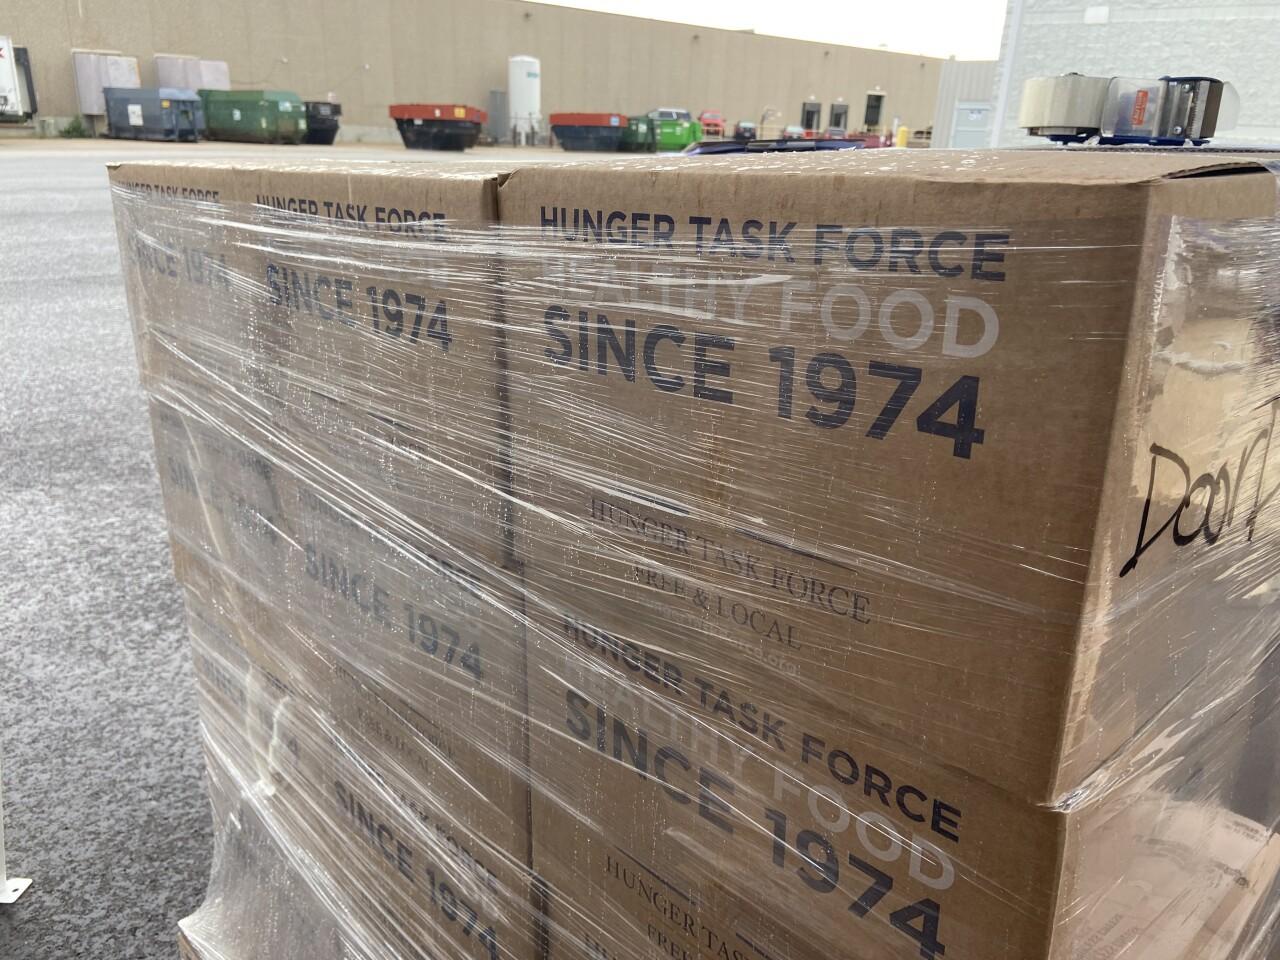 Hunger Task Force Stockboxes